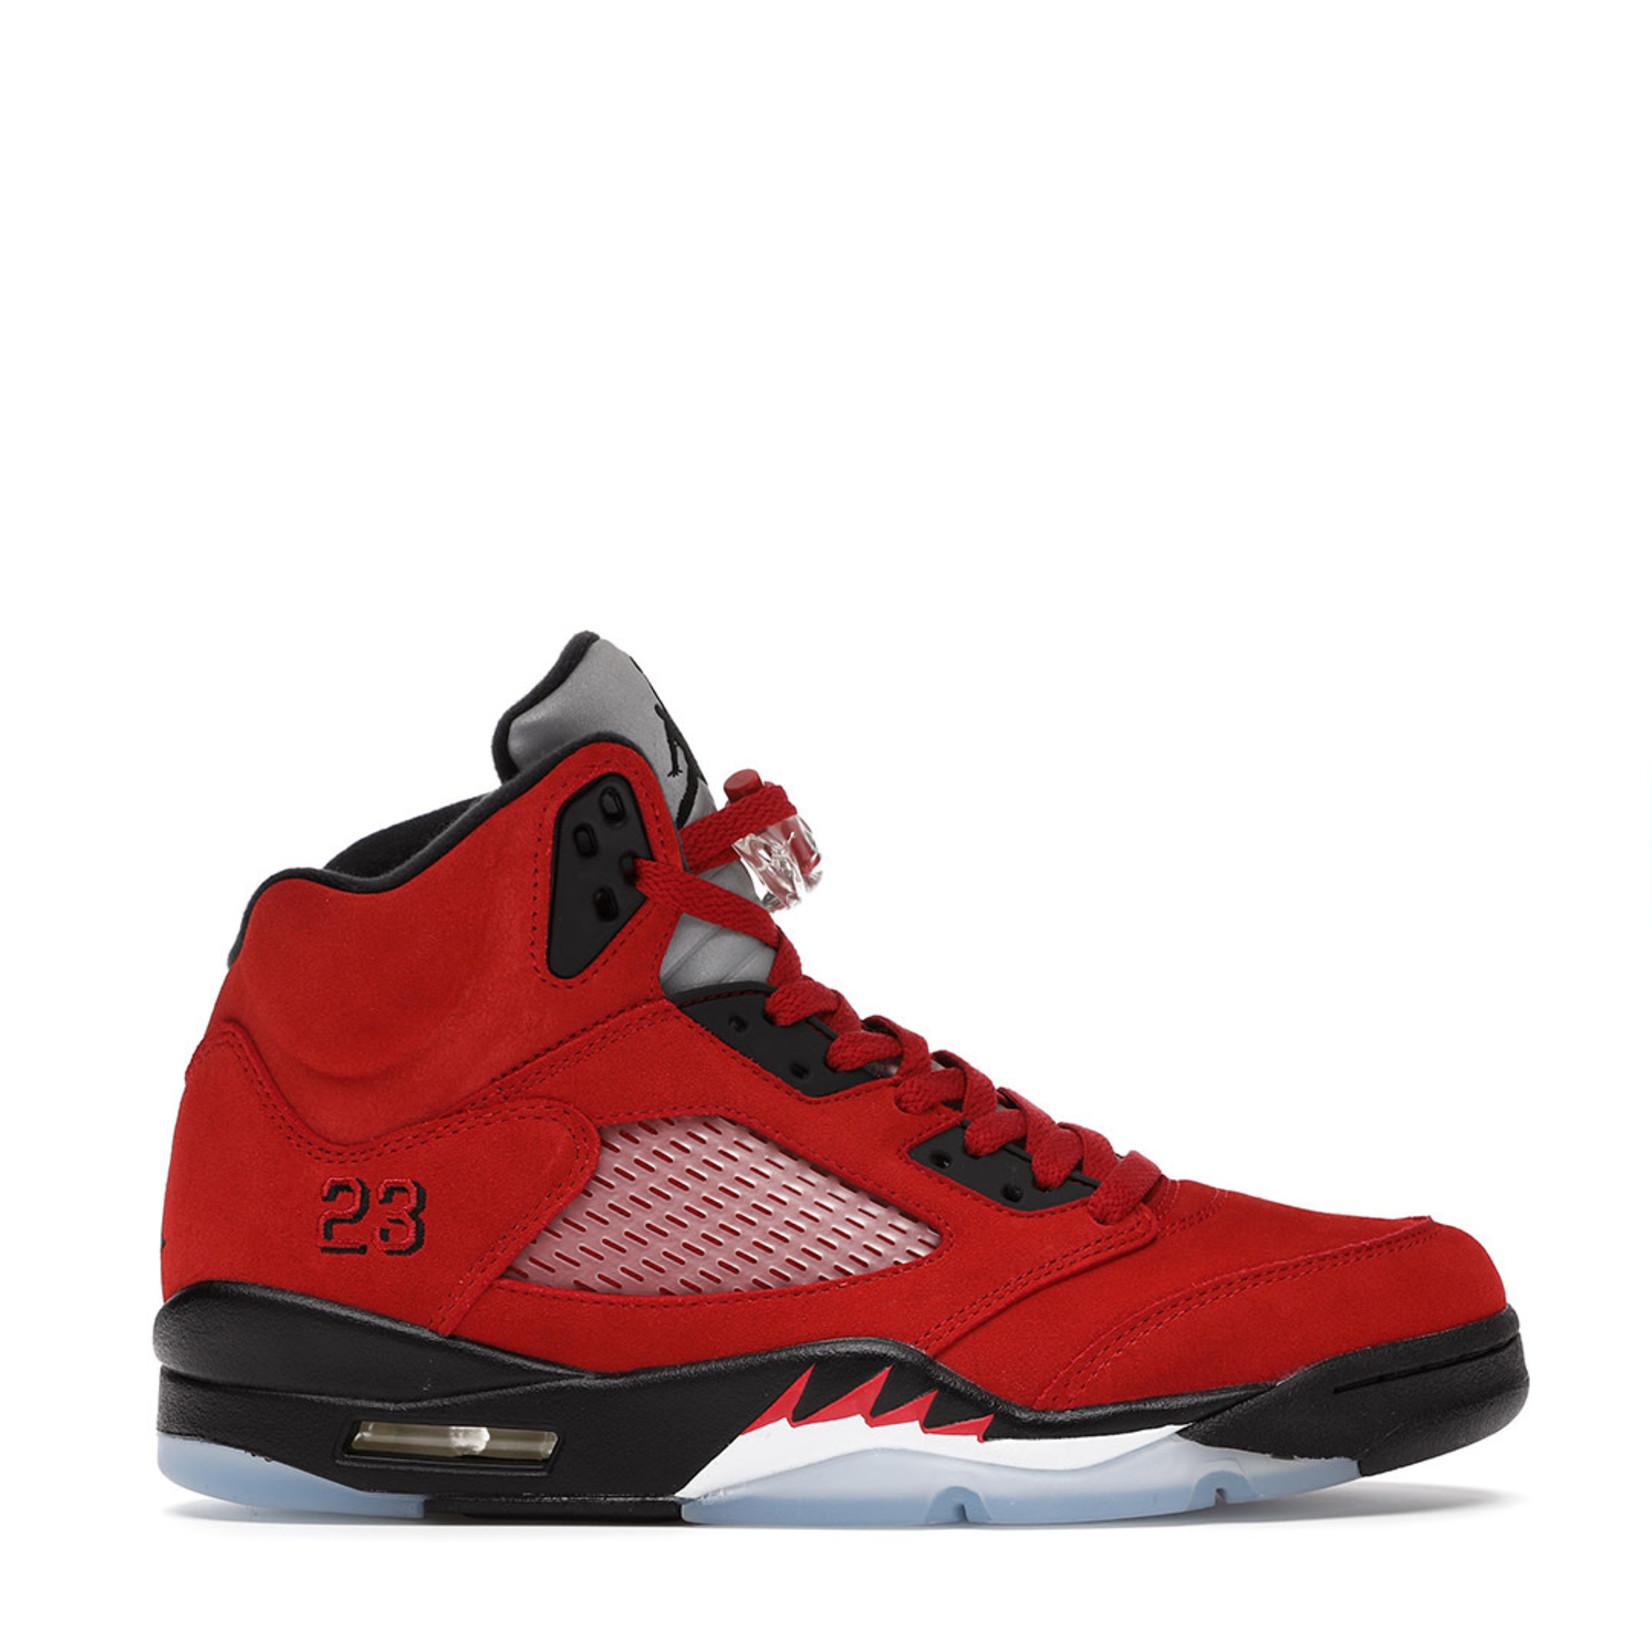 Jordan Jordan 5 Retro Raging Bulls